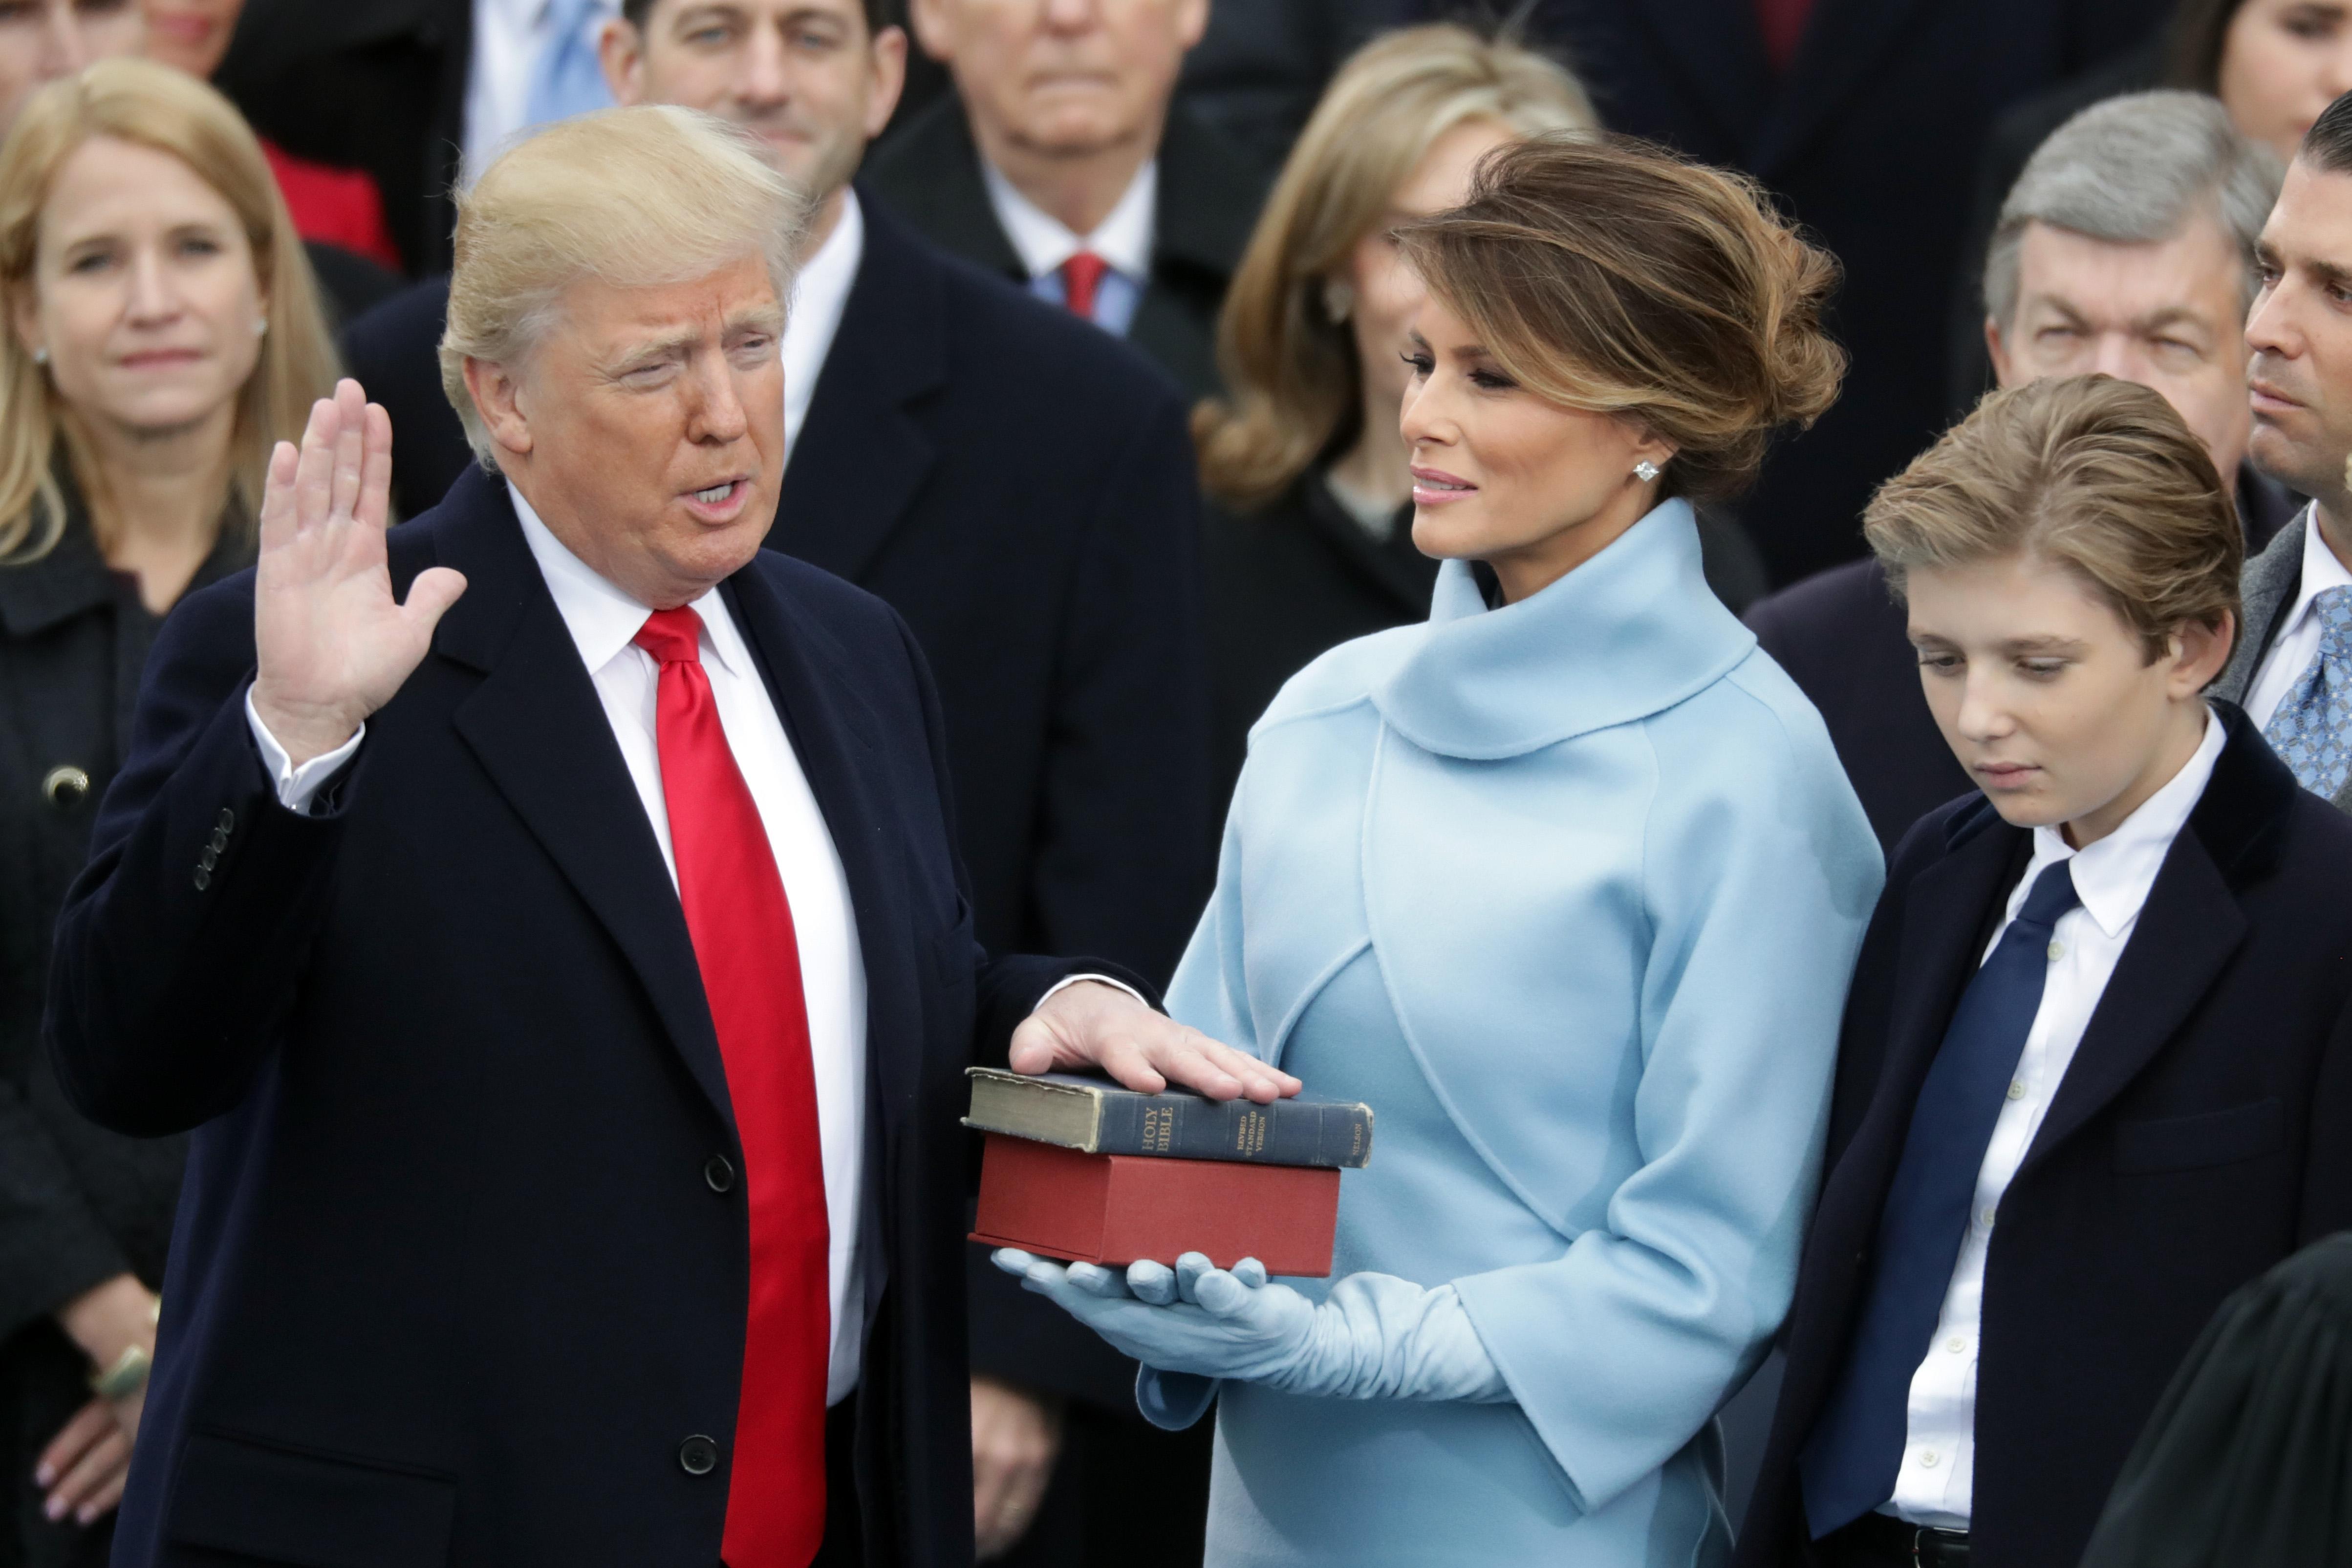 Donald Trump inaguración